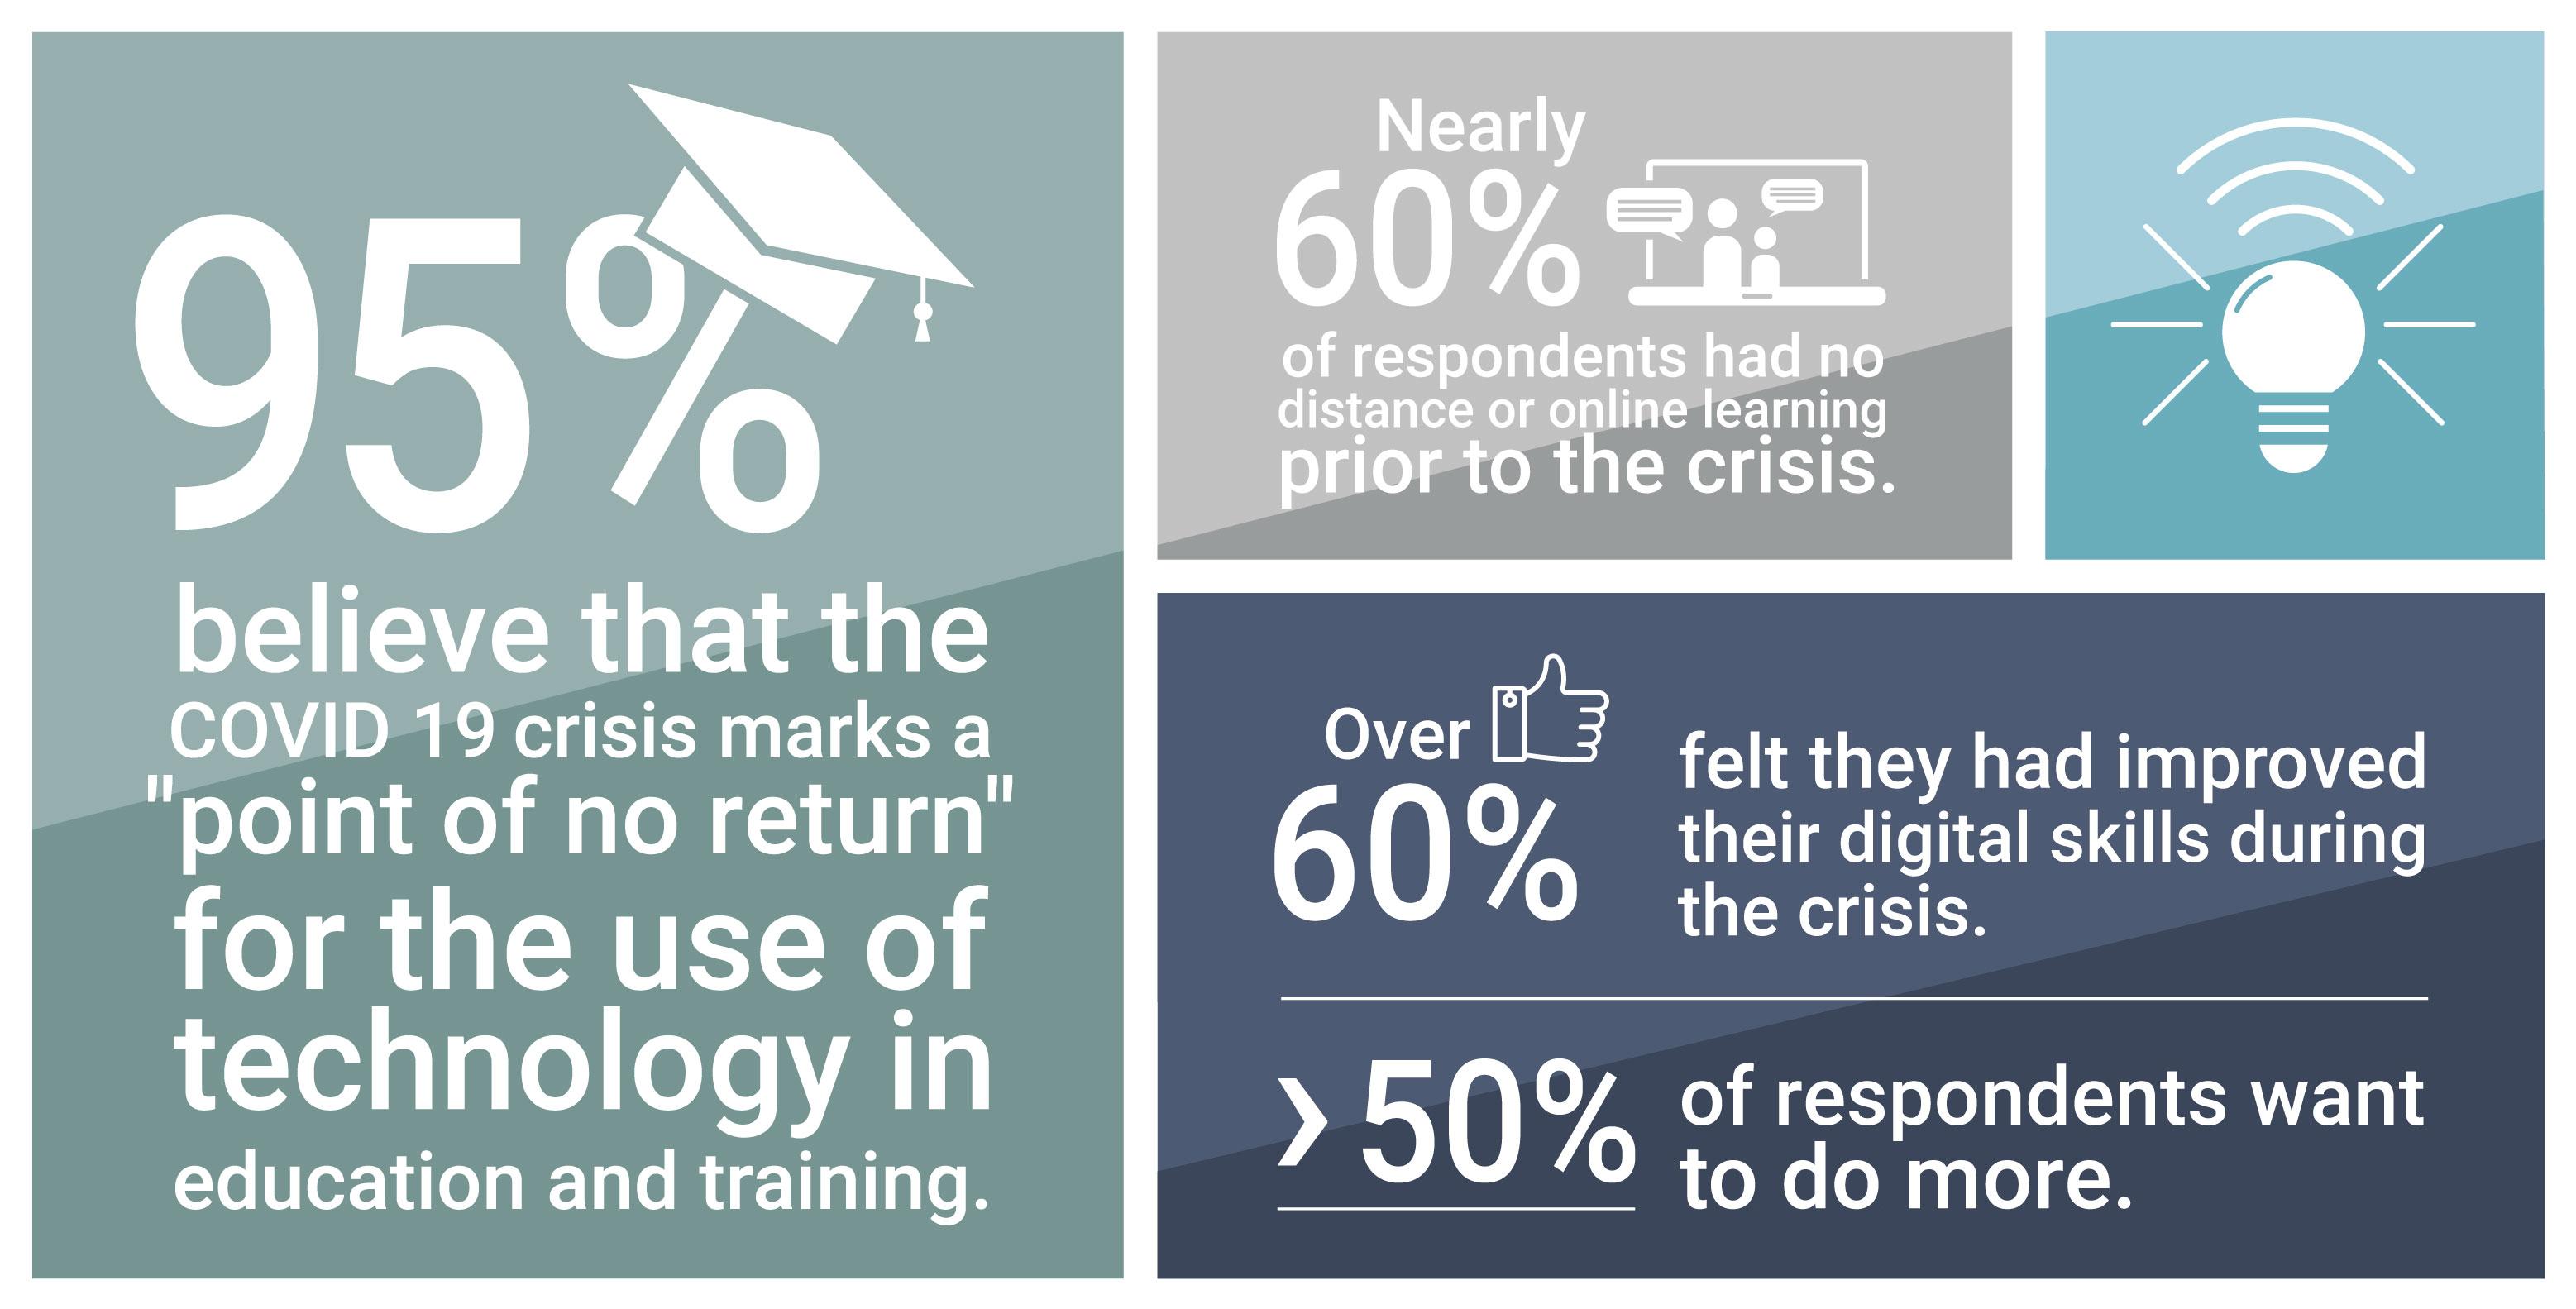 Digital schooling statistics